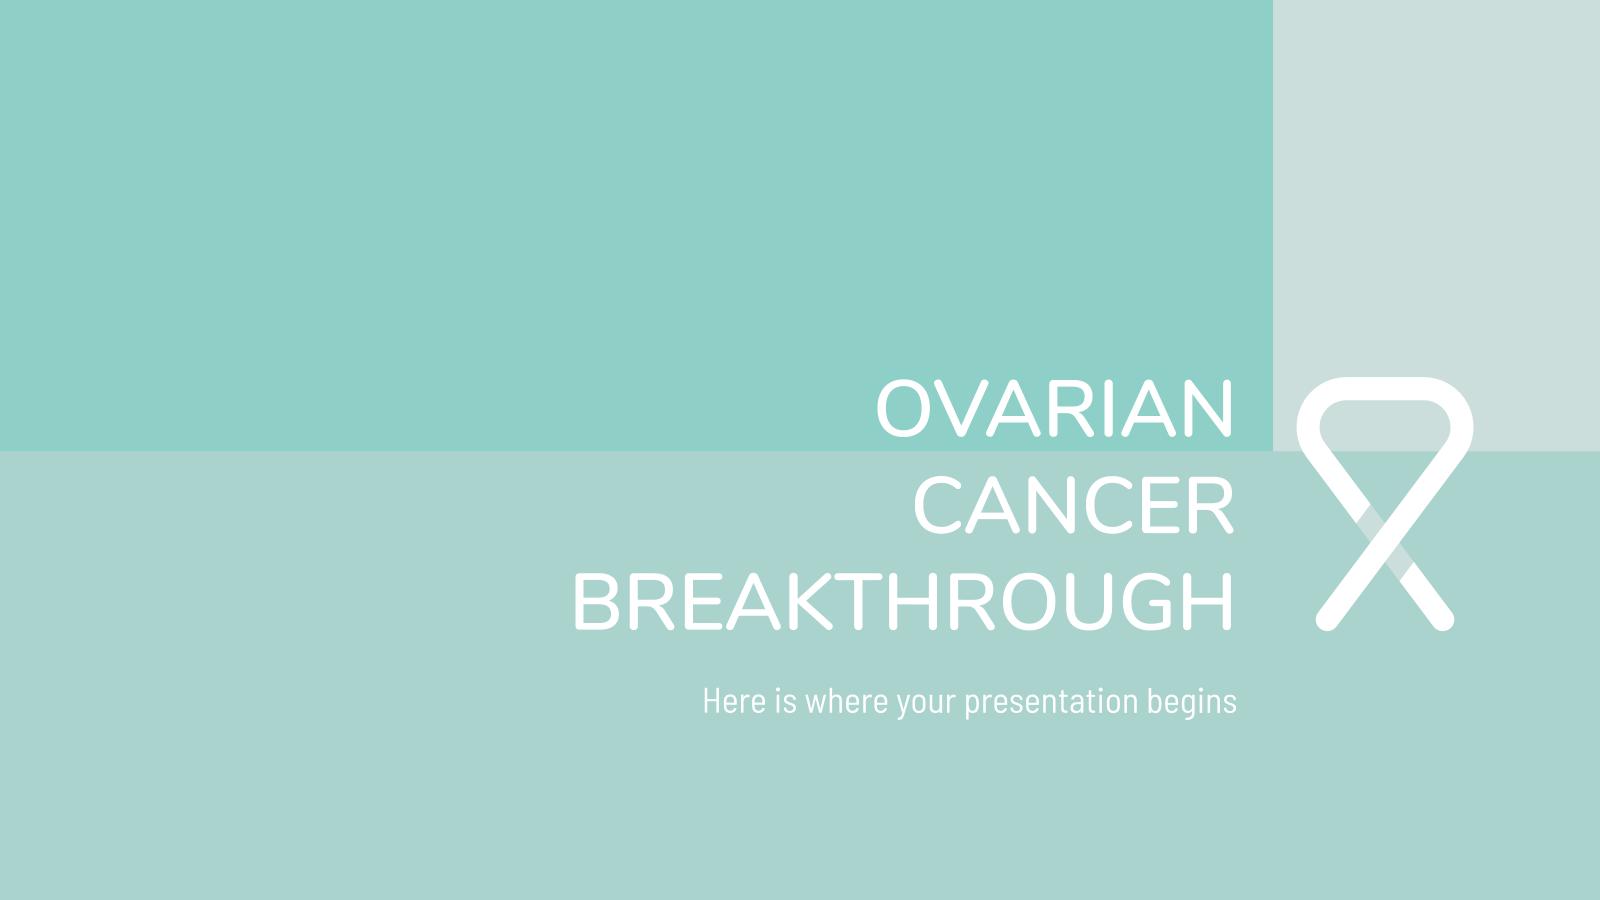 Ovarian Cancer Breakthrough presentation template